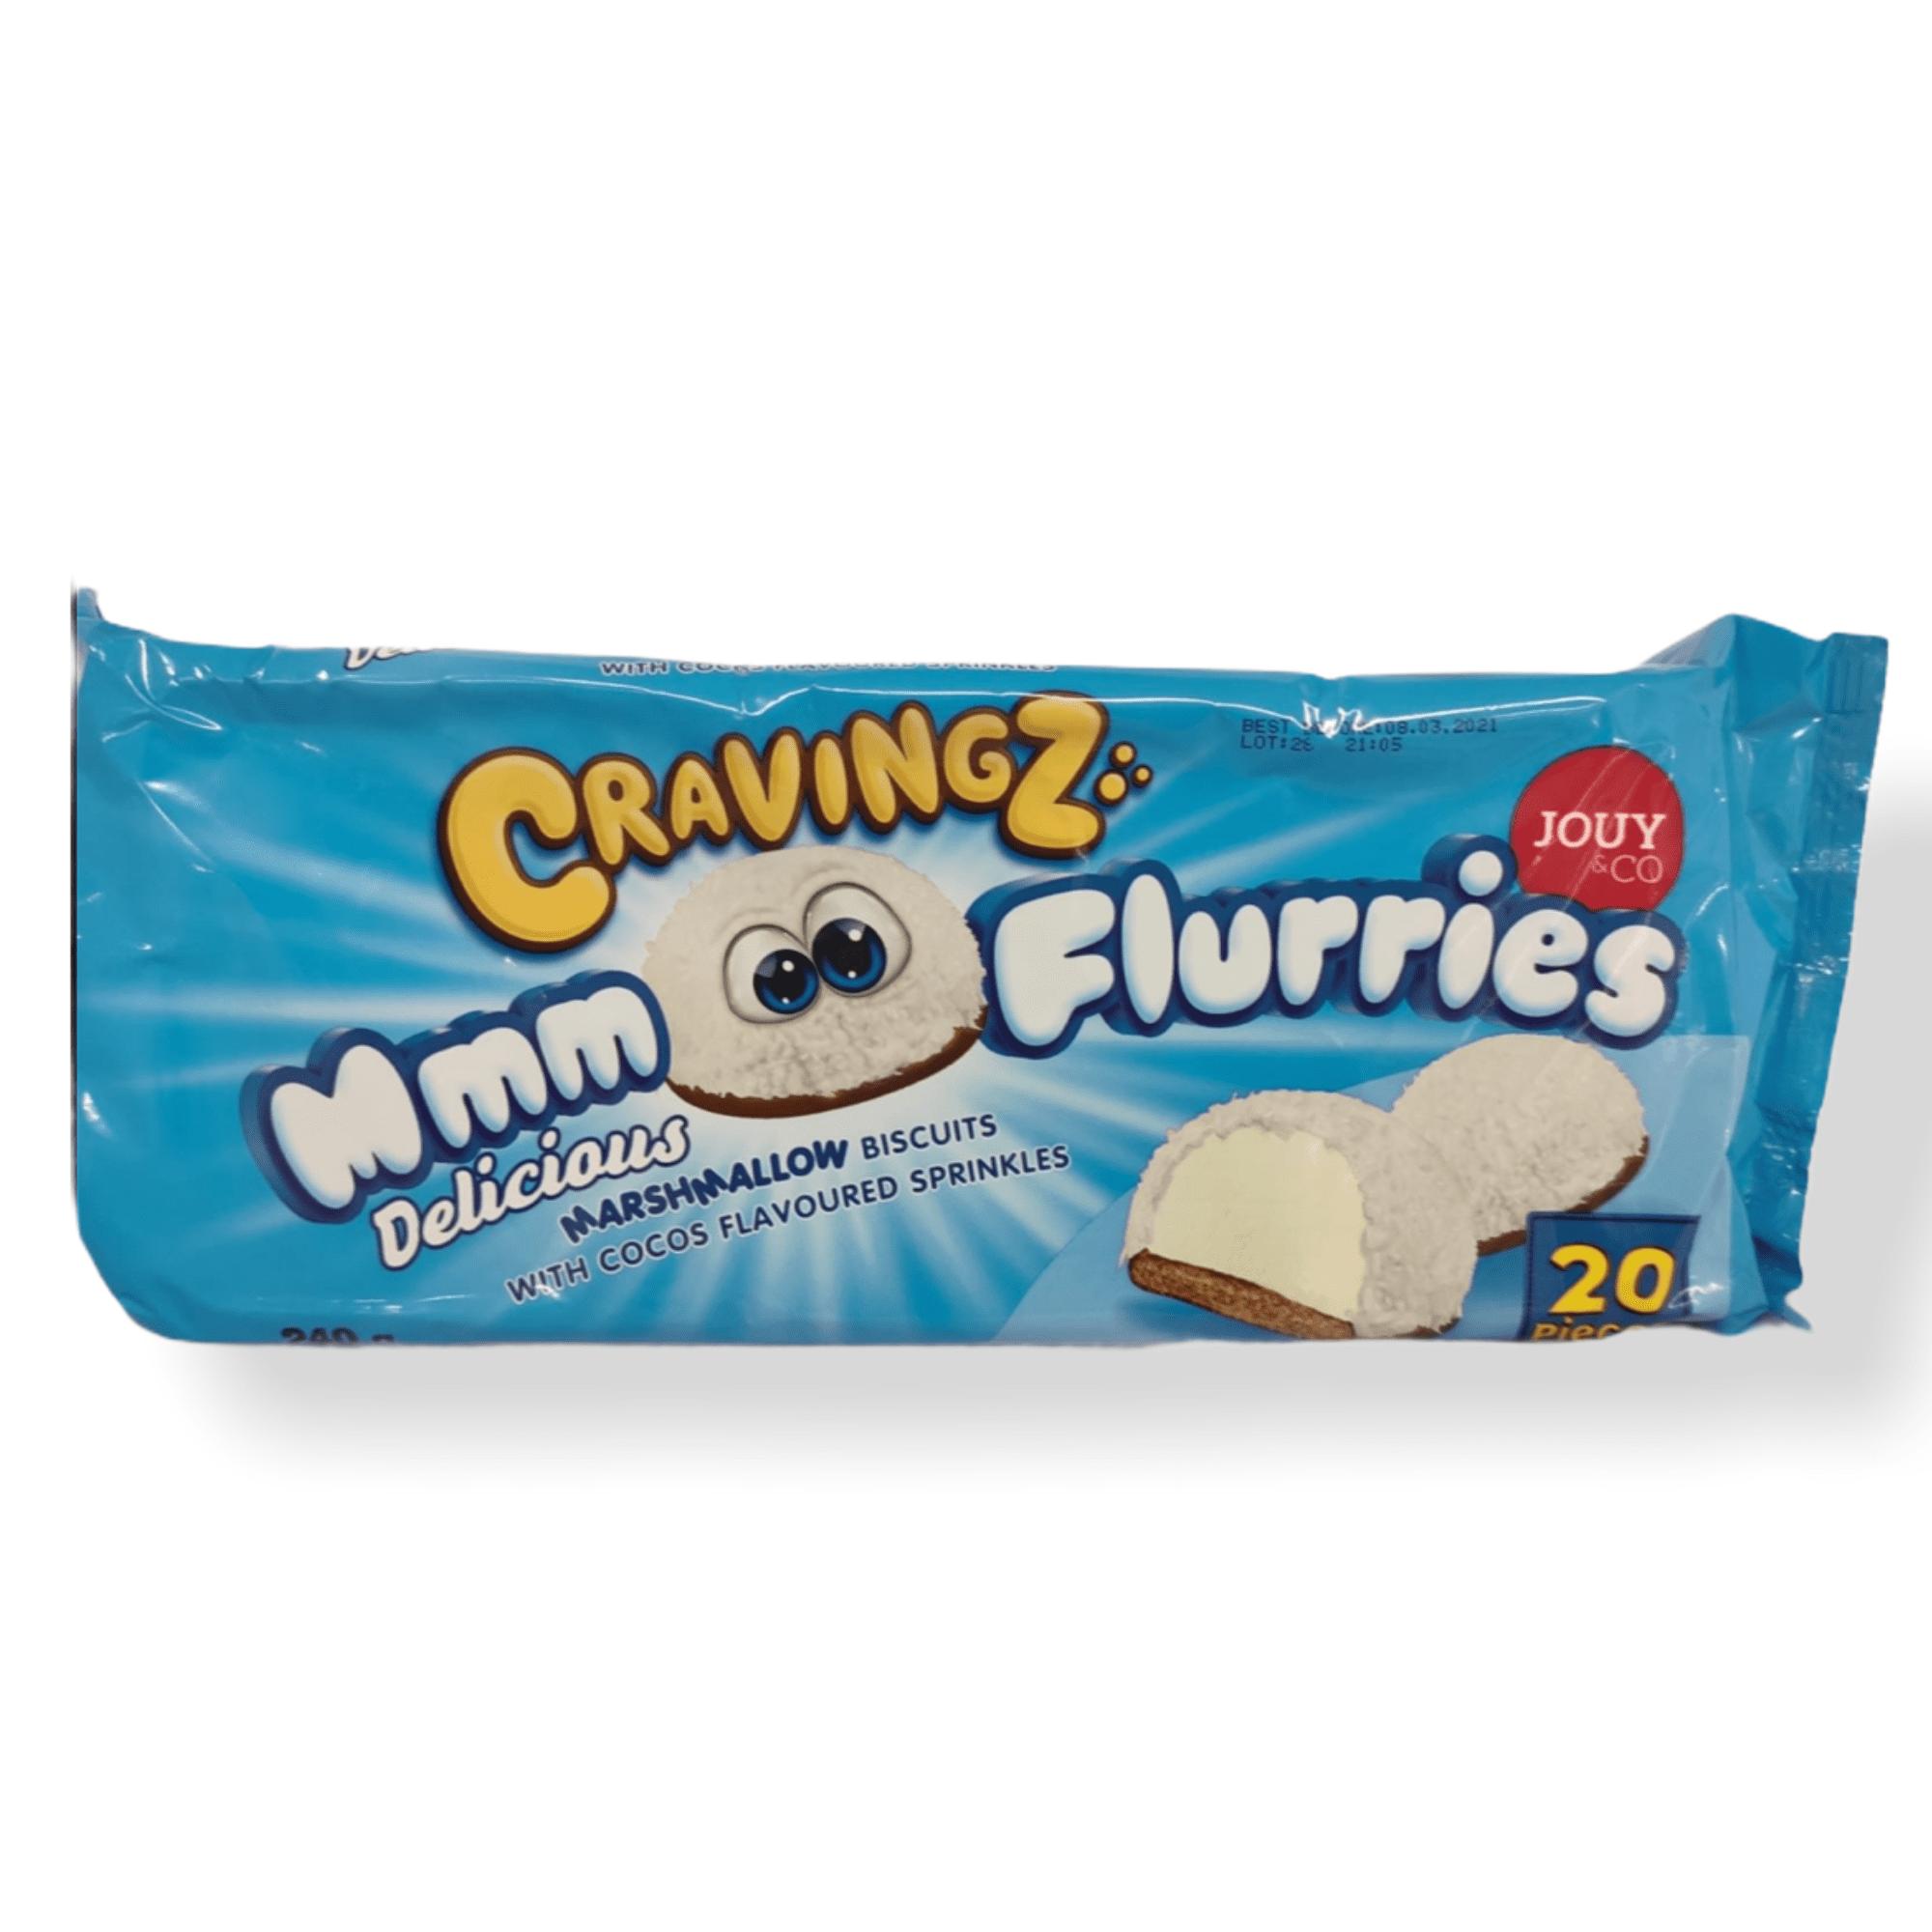 Cravingz Flurries Kokos Marshmallow Keks mit Kokos Streusel 240g